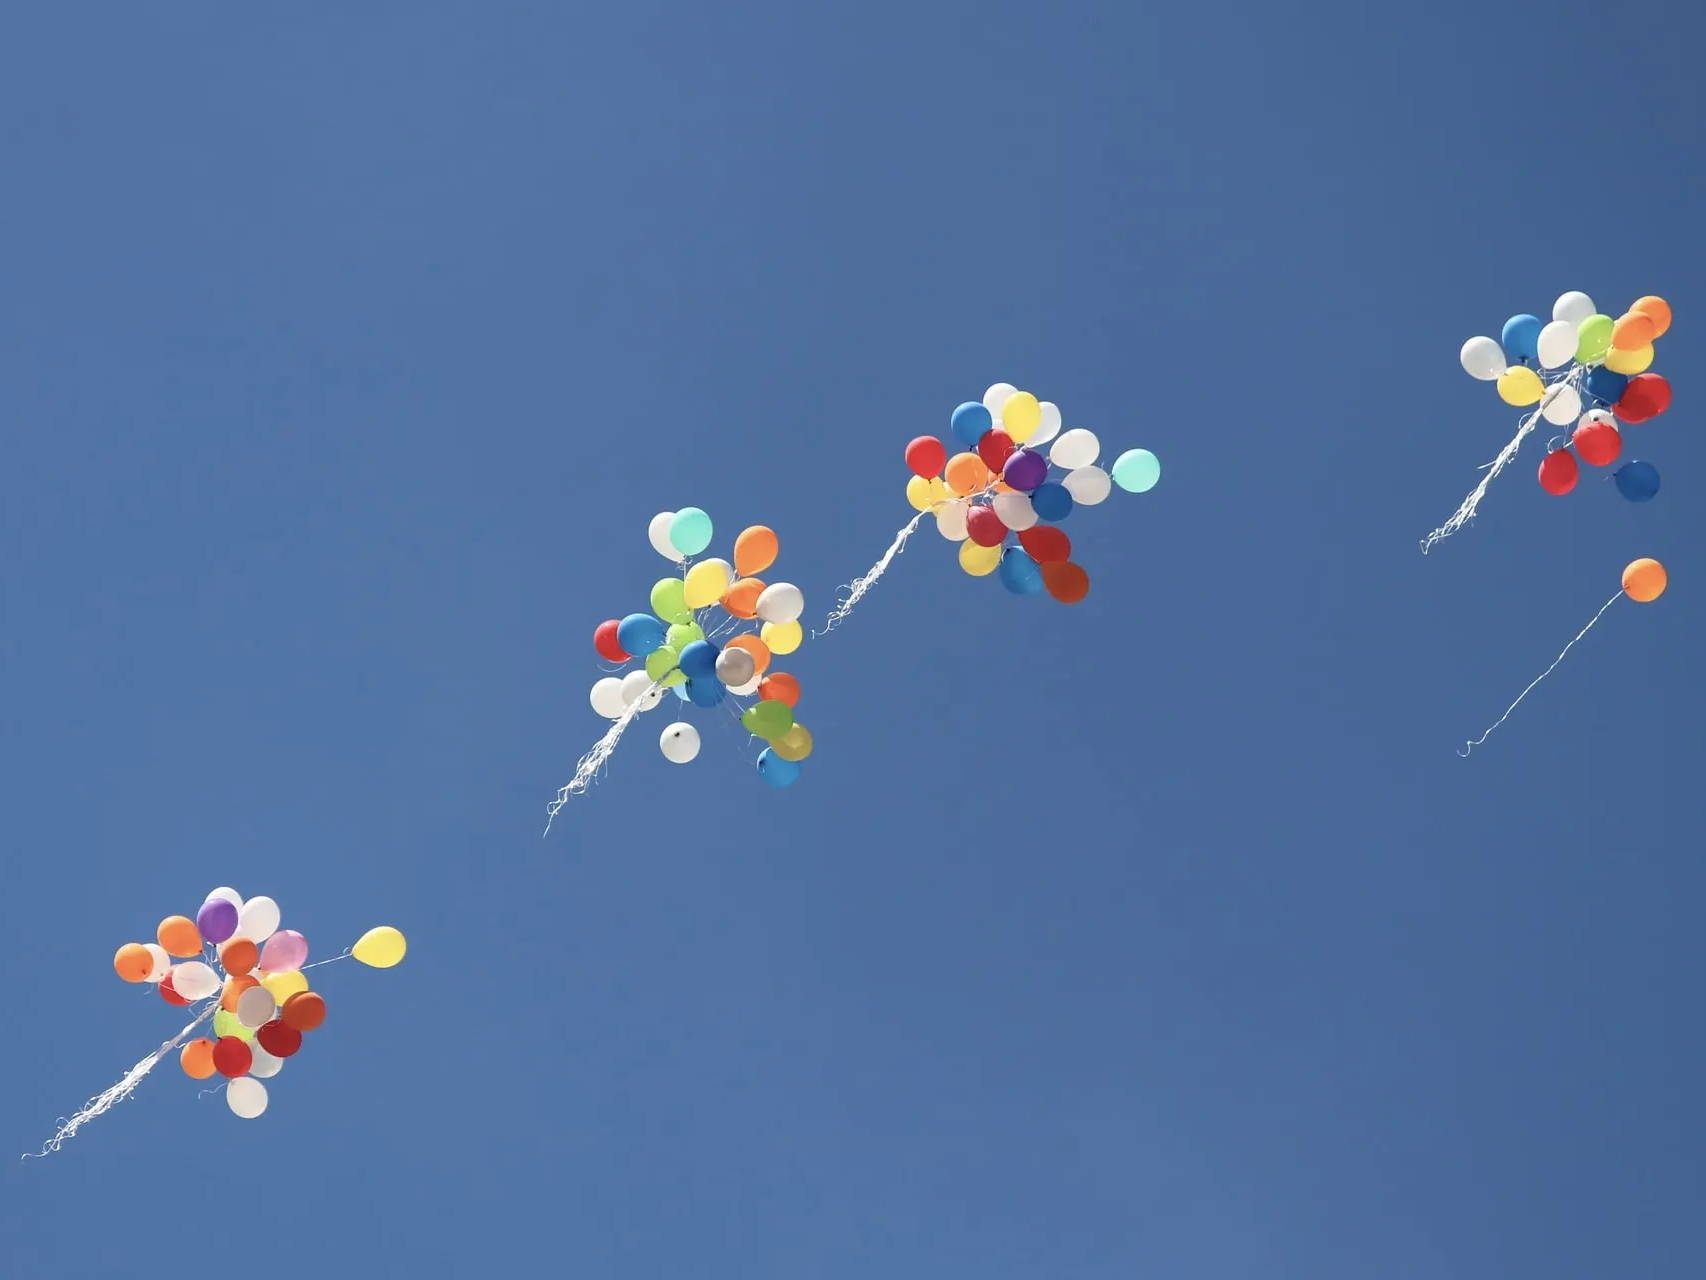 Four bundles of balloons floating away